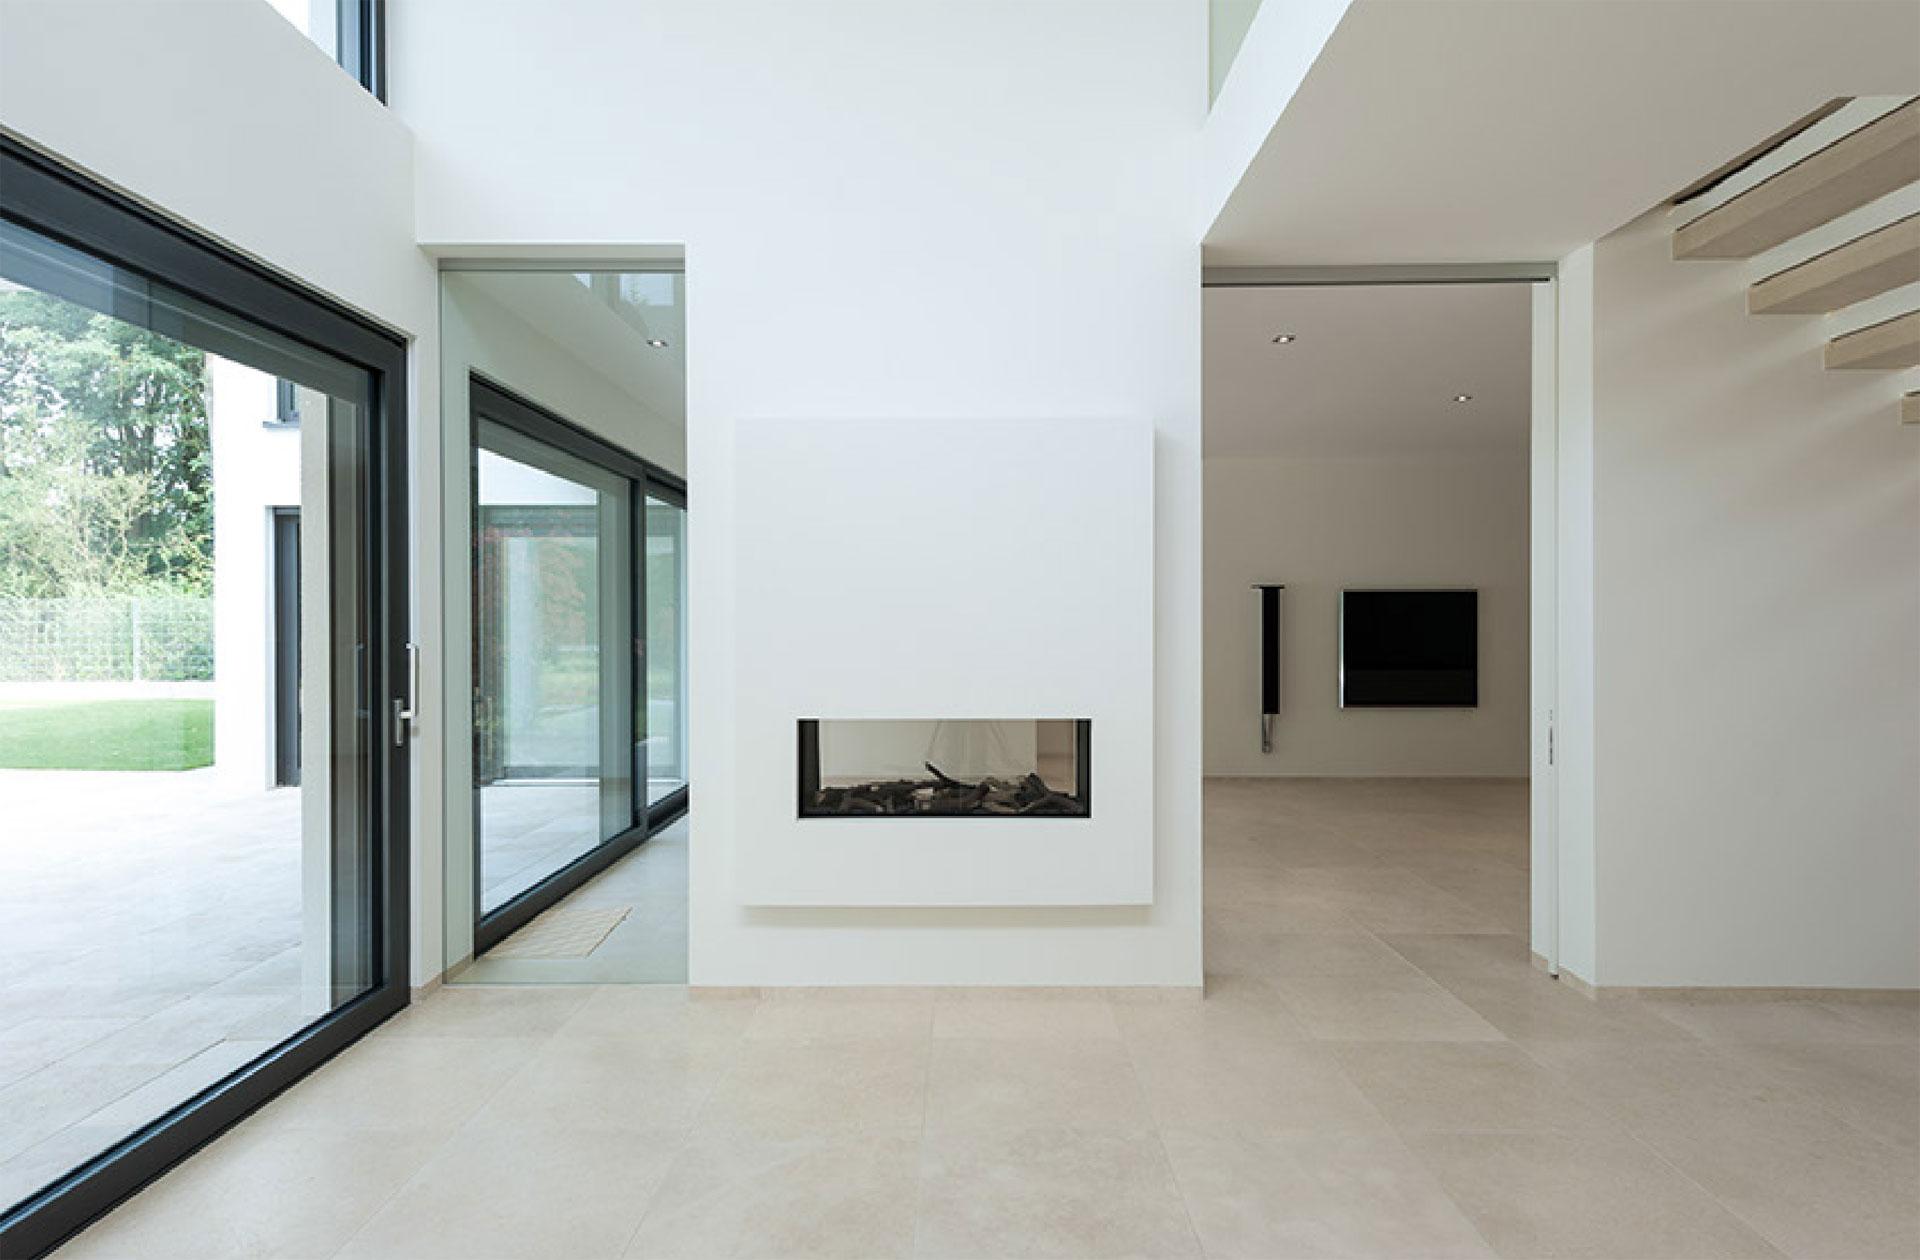 neubau rheinland pfalz. Black Bedroom Furniture Sets. Home Design Ideas